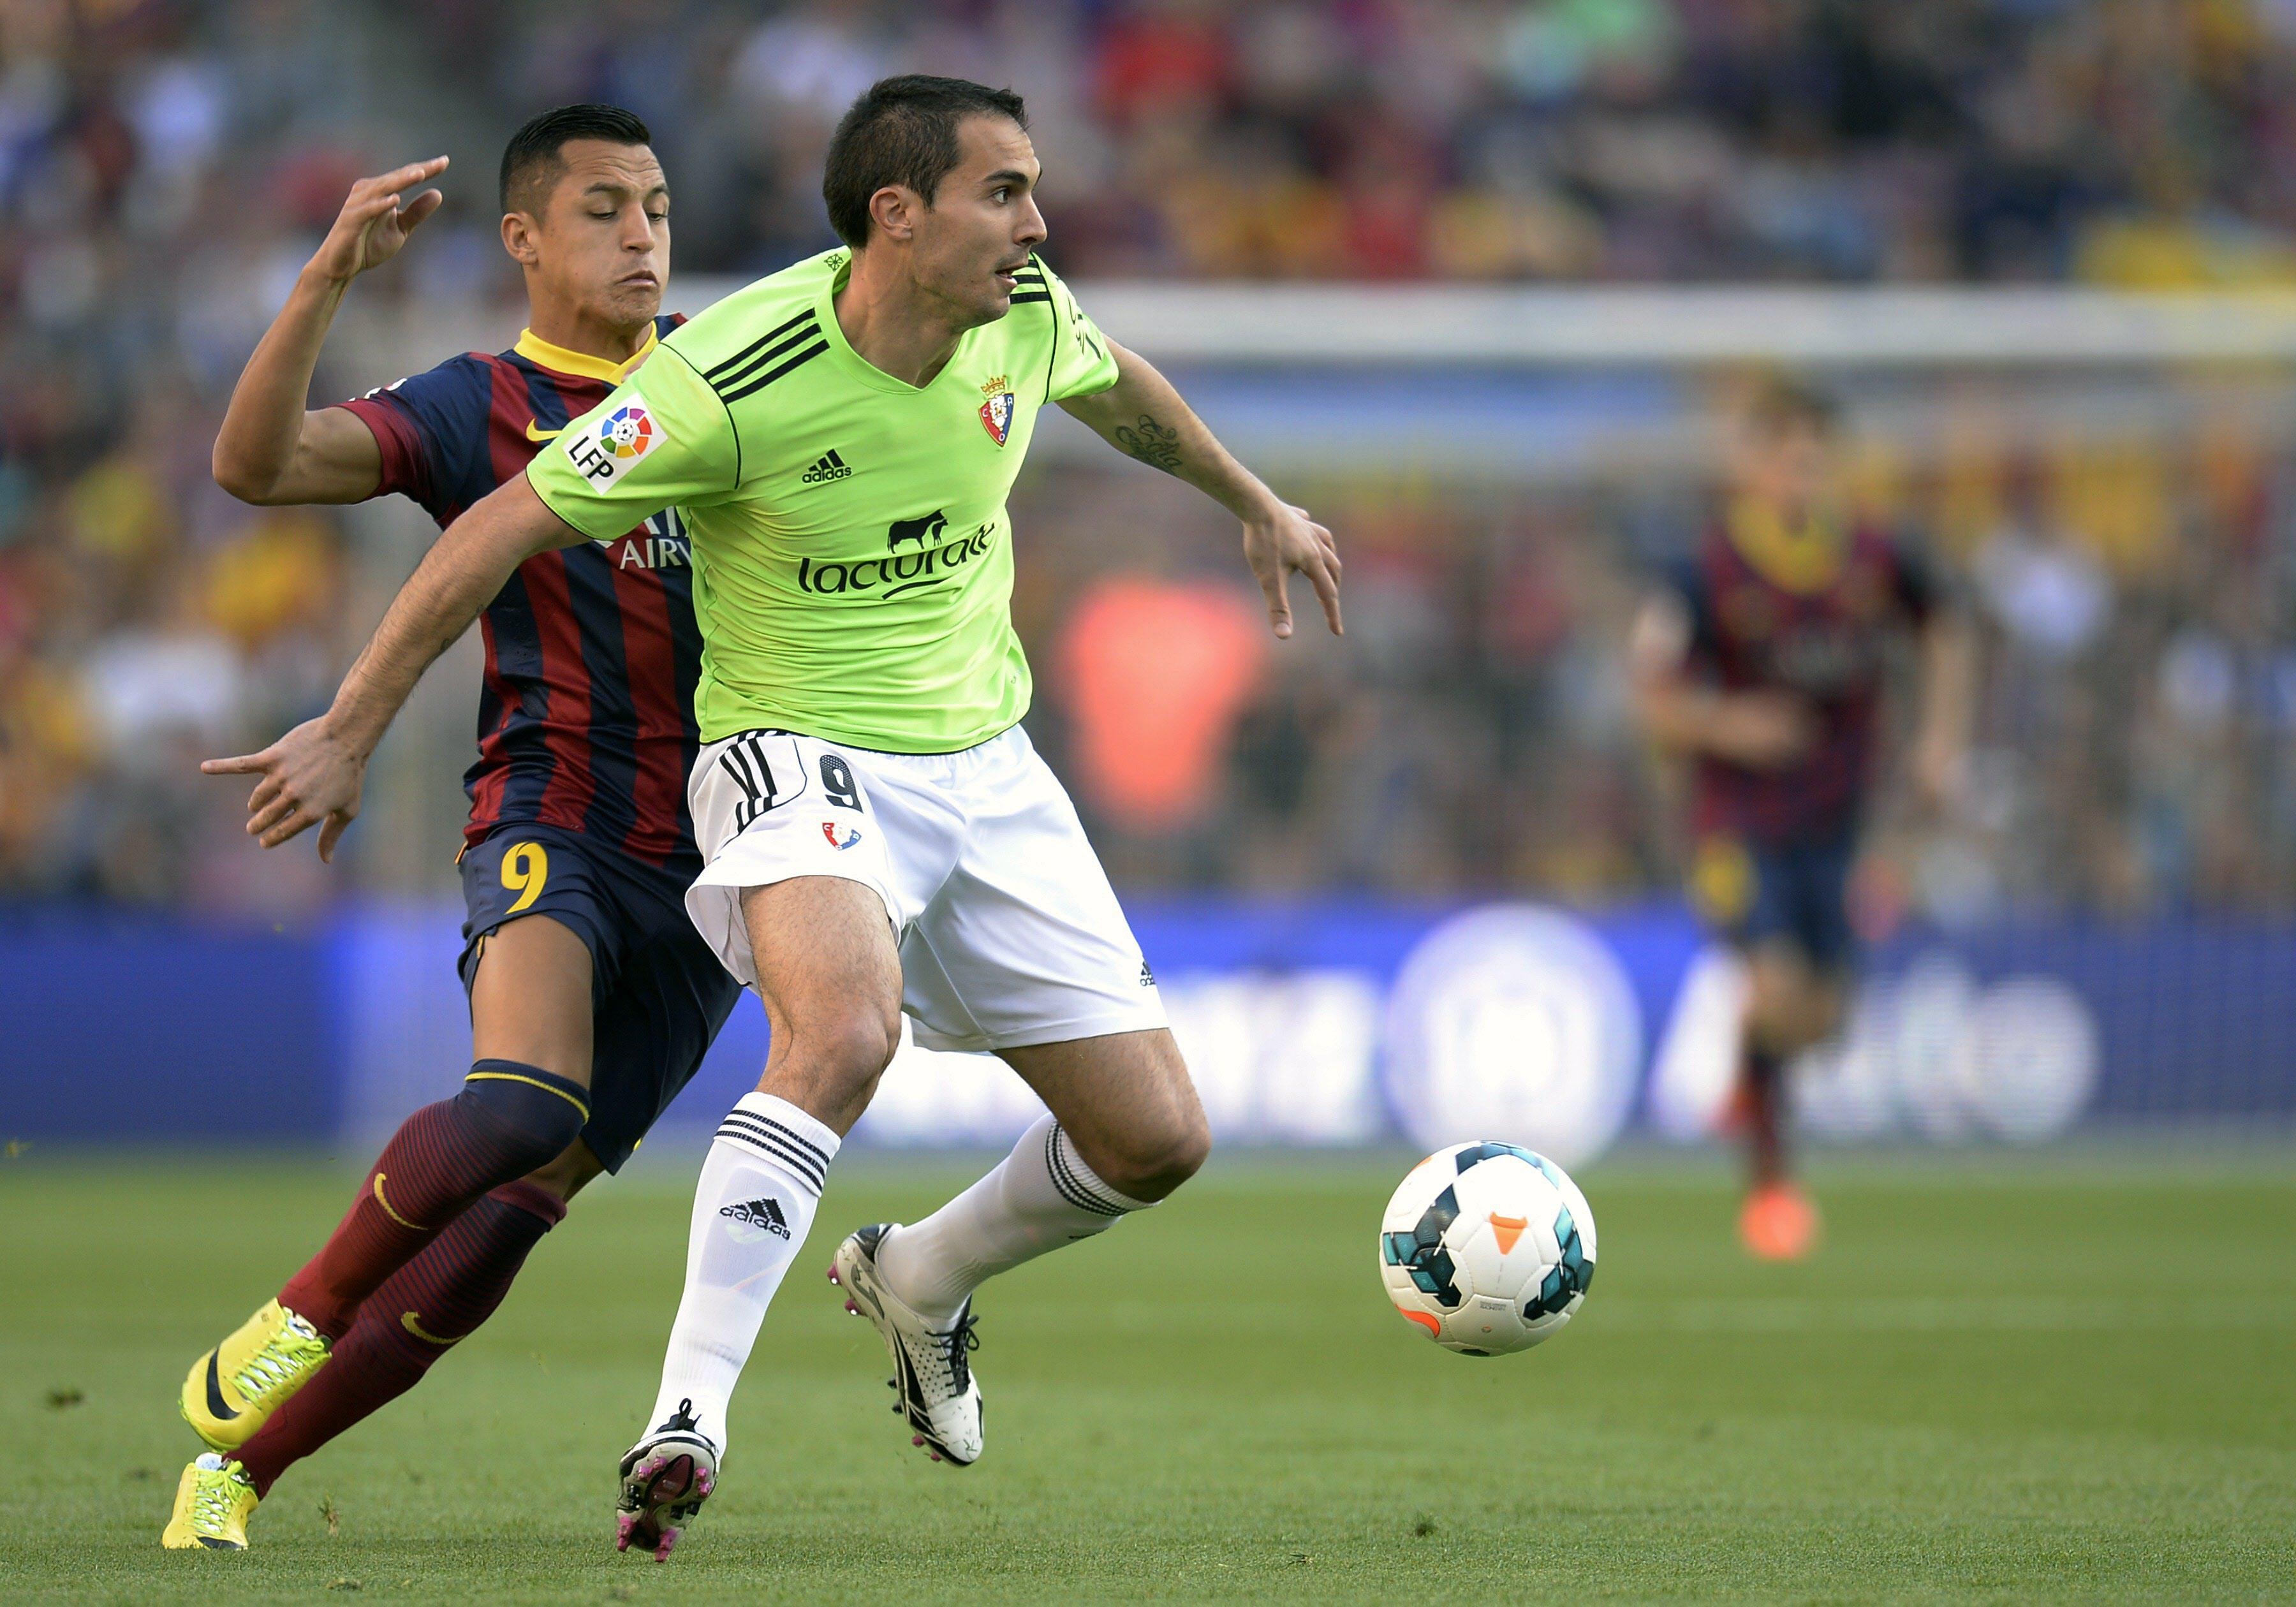 El Barcelona golea a Osasuna